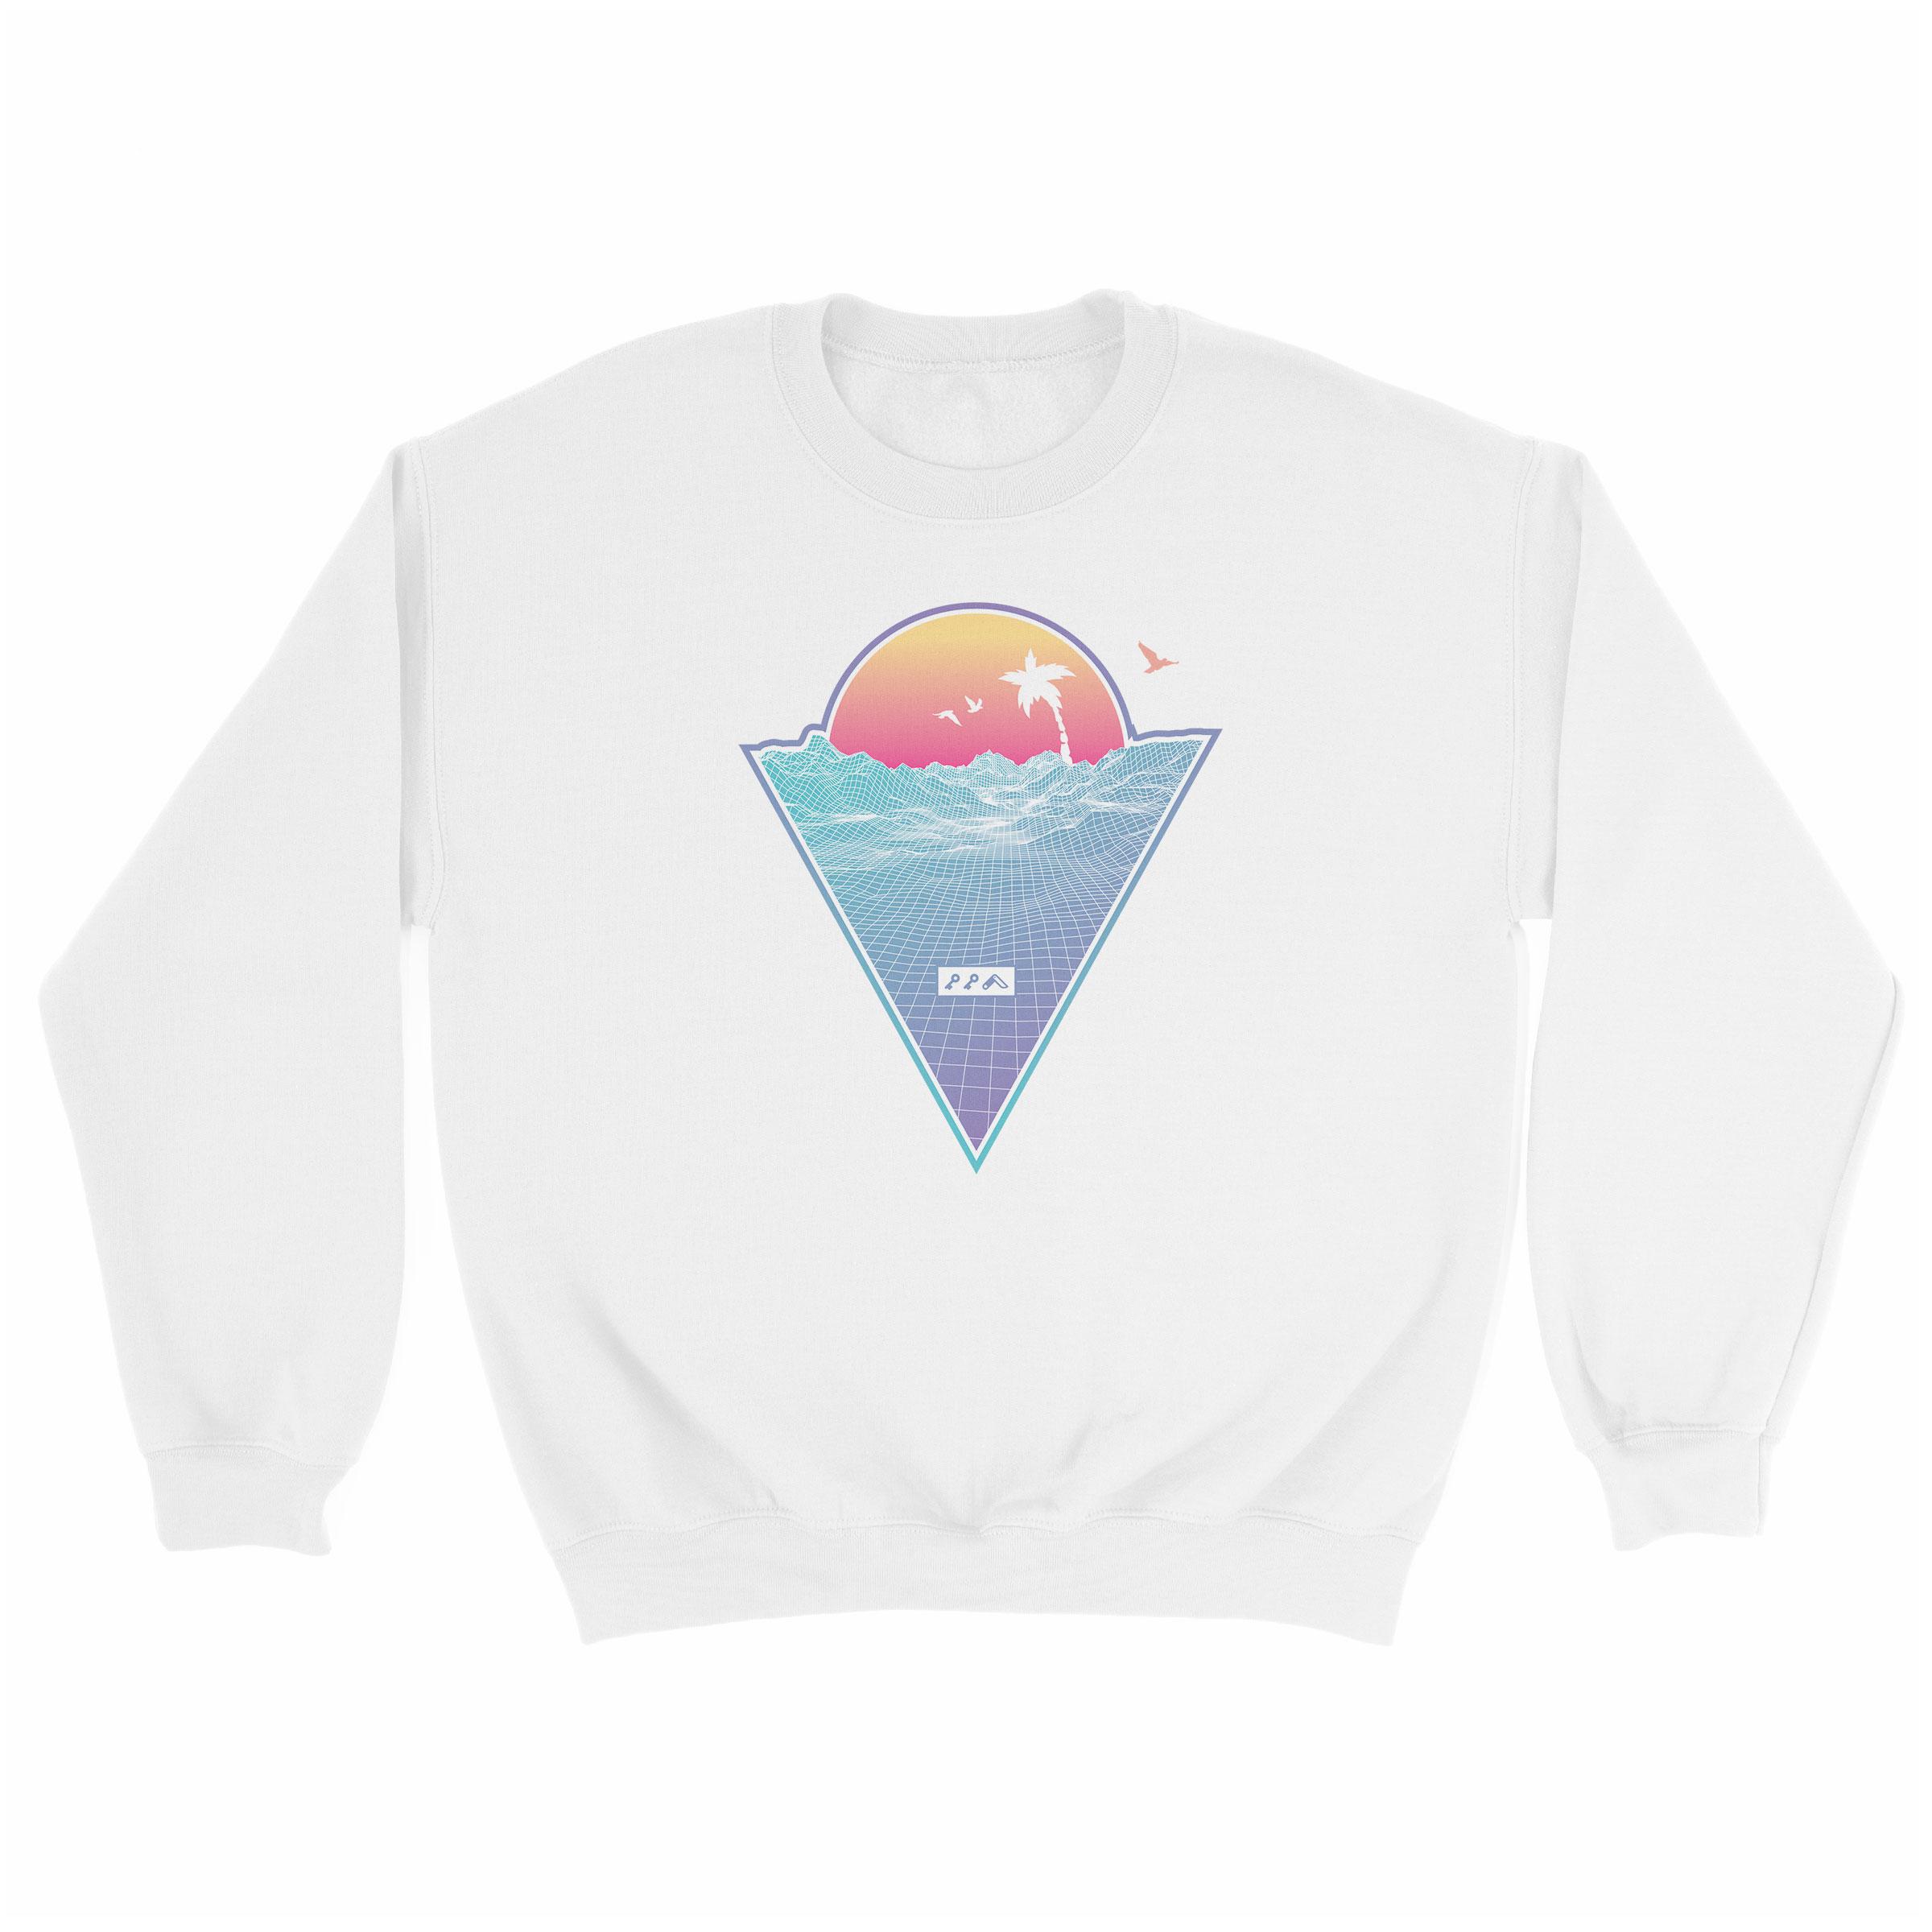 """OFF THE GRID"" cali vibes retro 80s design sweatshirt white at kikicutt.com"